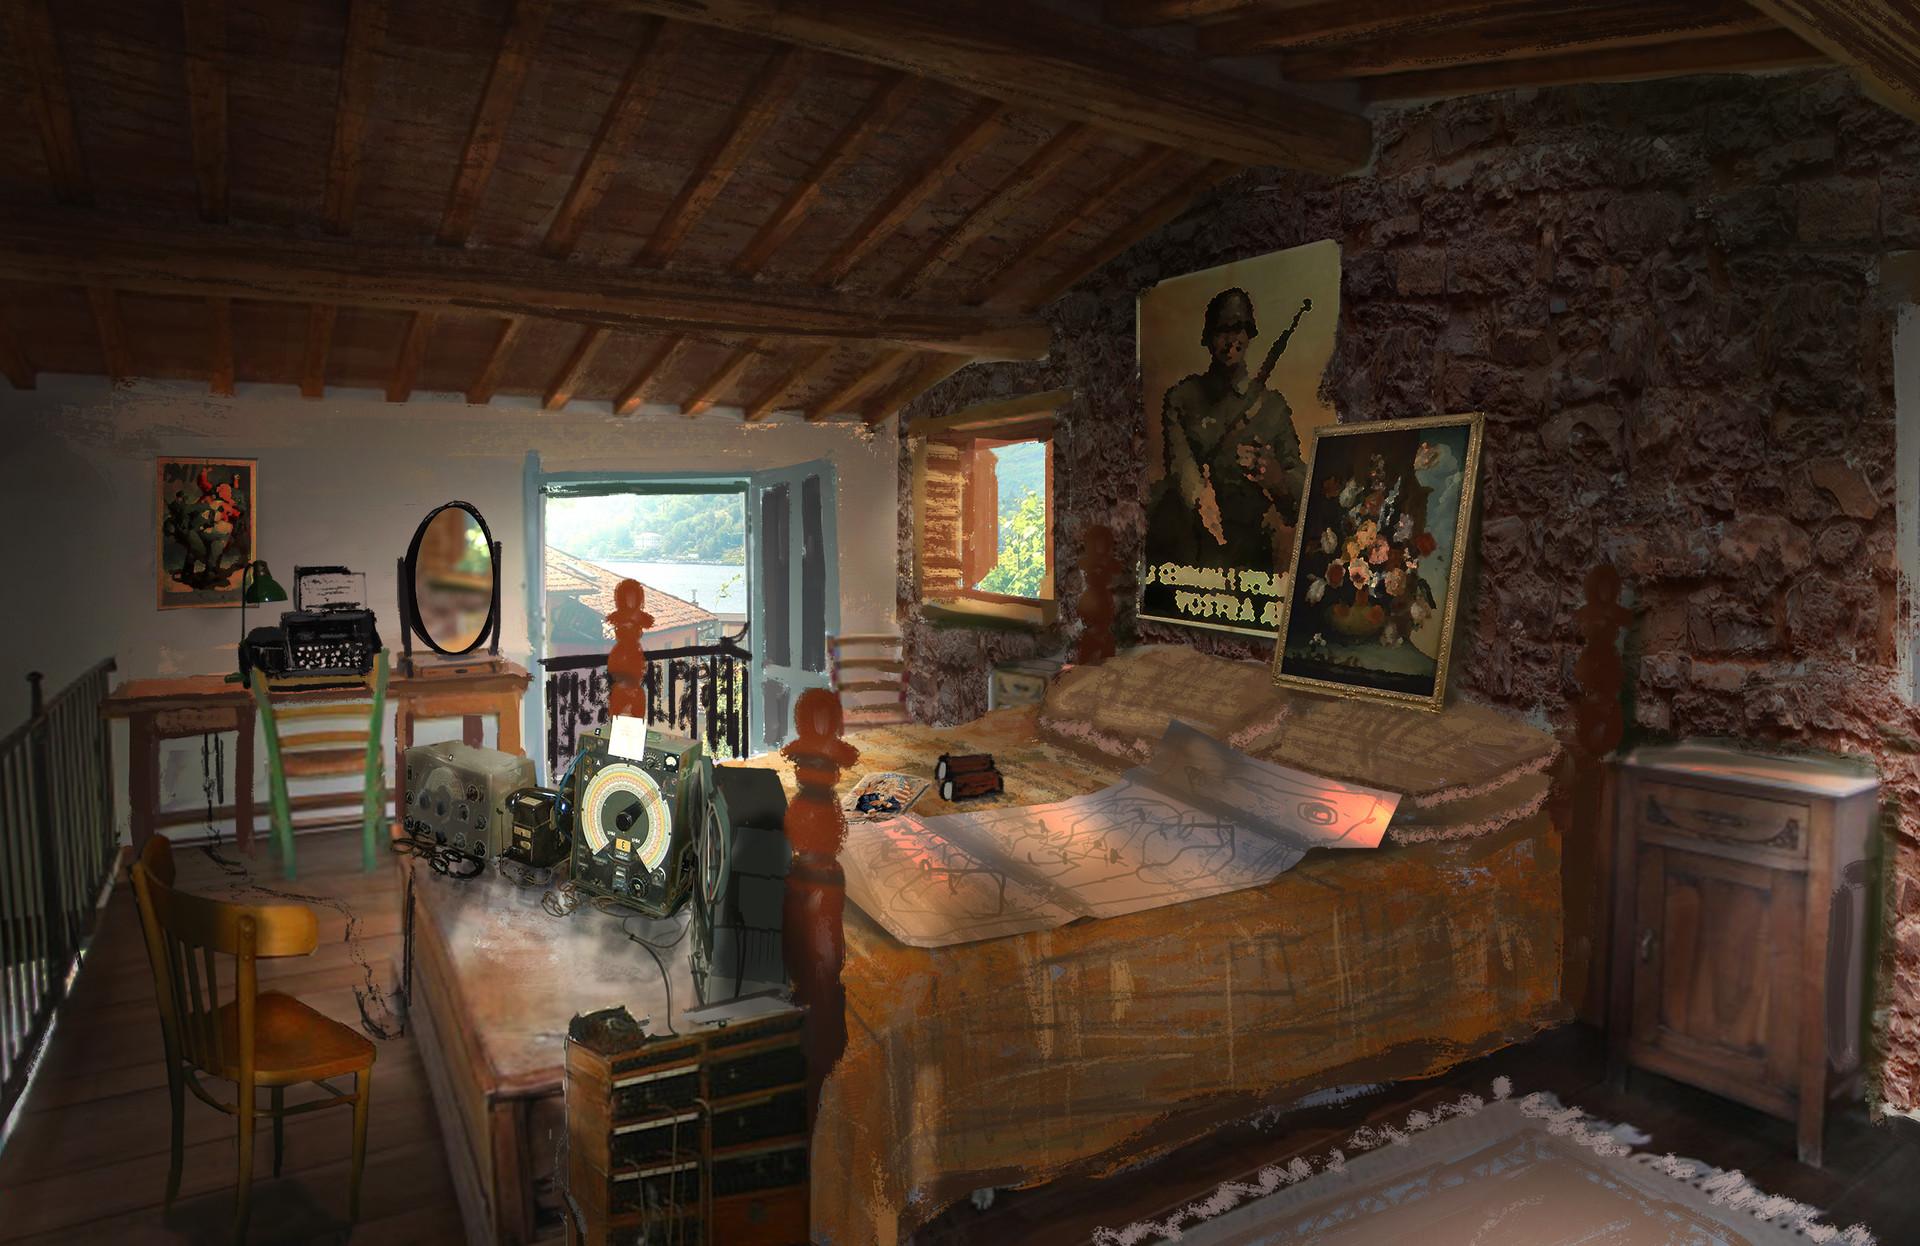 Jack eaves mountain forest village interior radioroom2